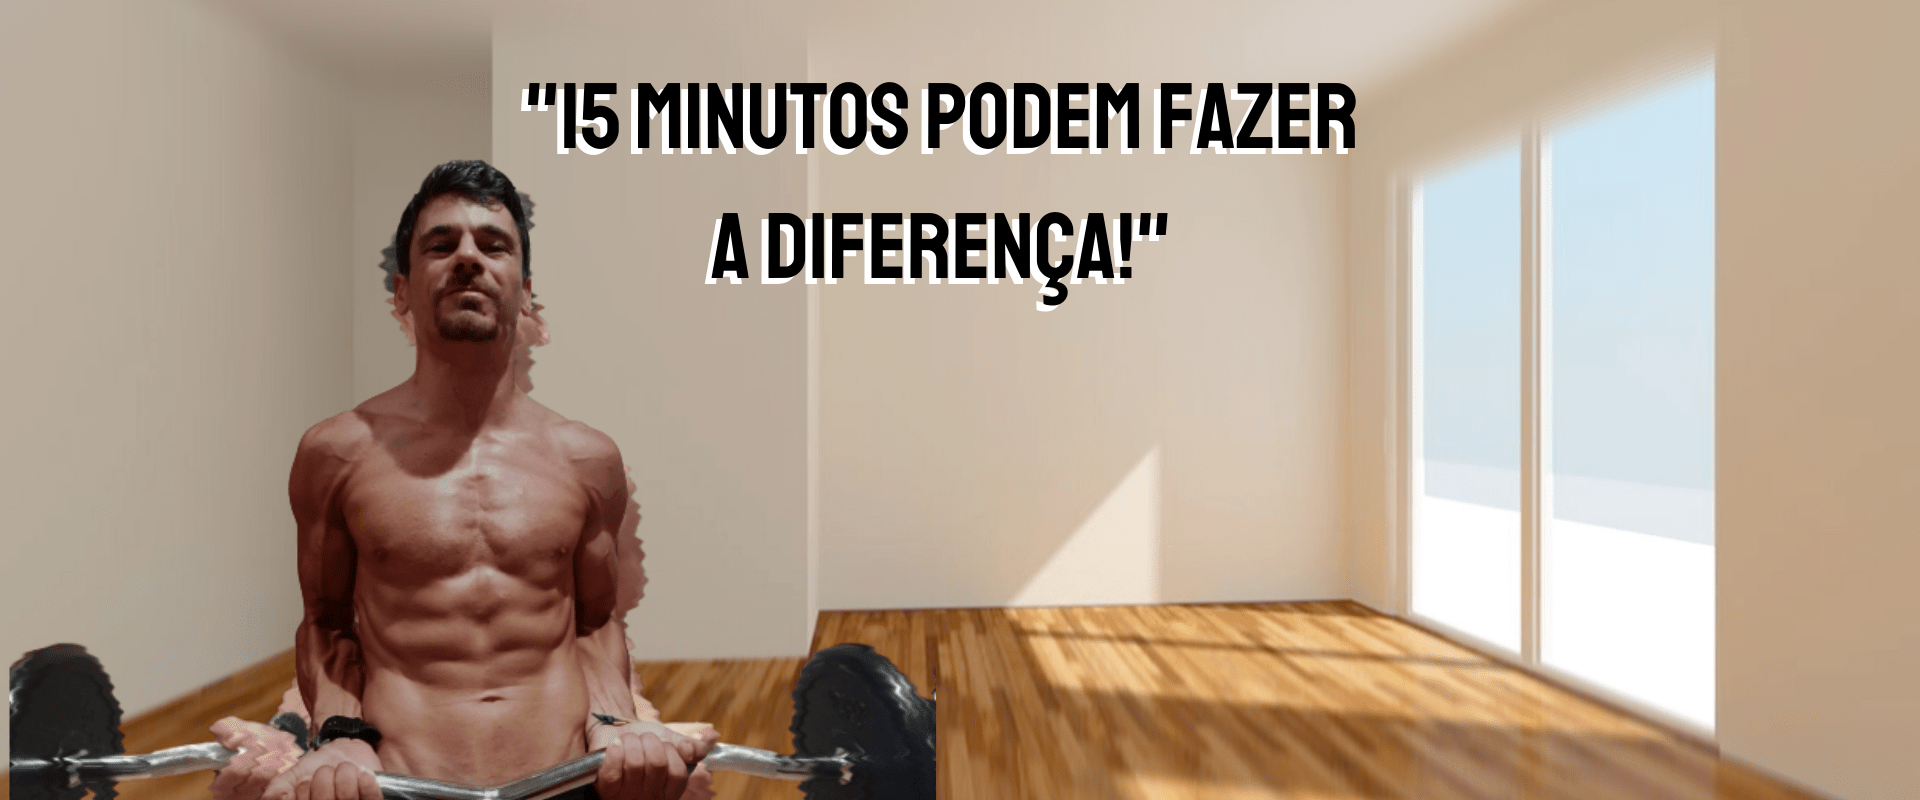 Método Dr Performance 15 minutos